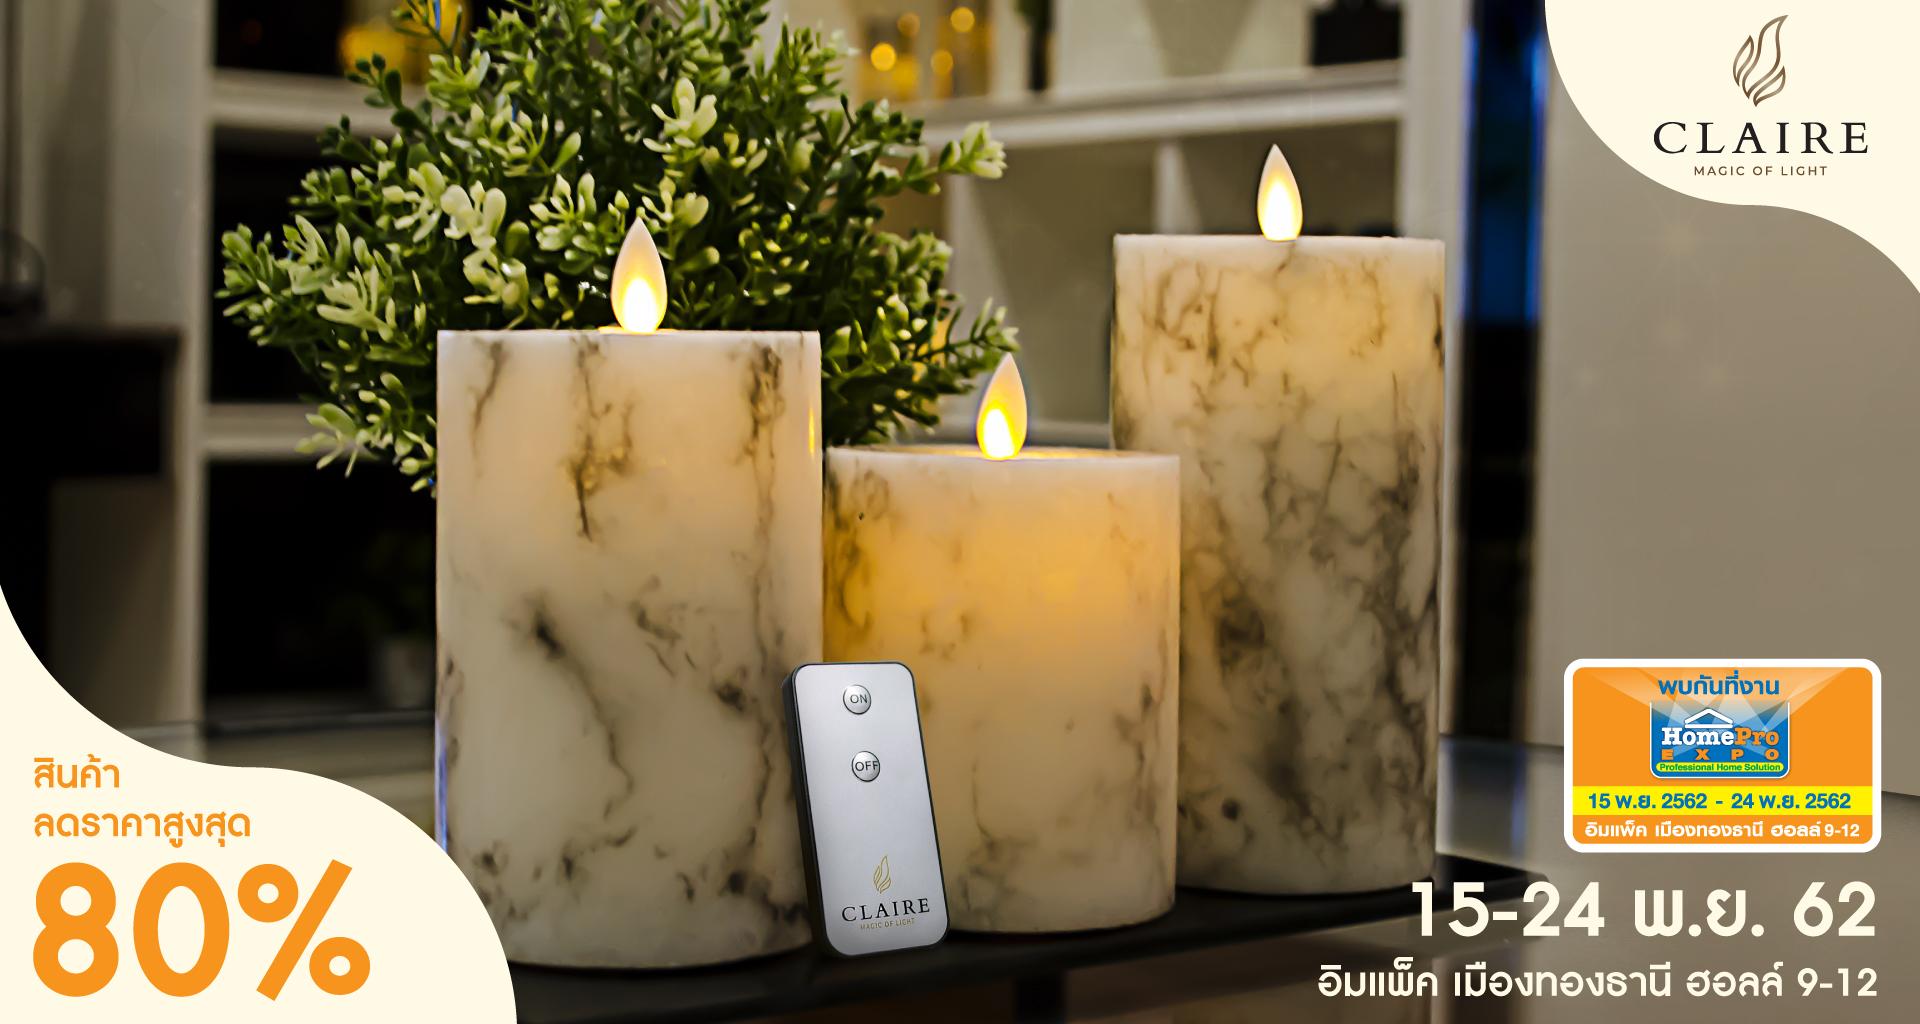 1569486662_0_banner-web-candle-1920x1024.jpg